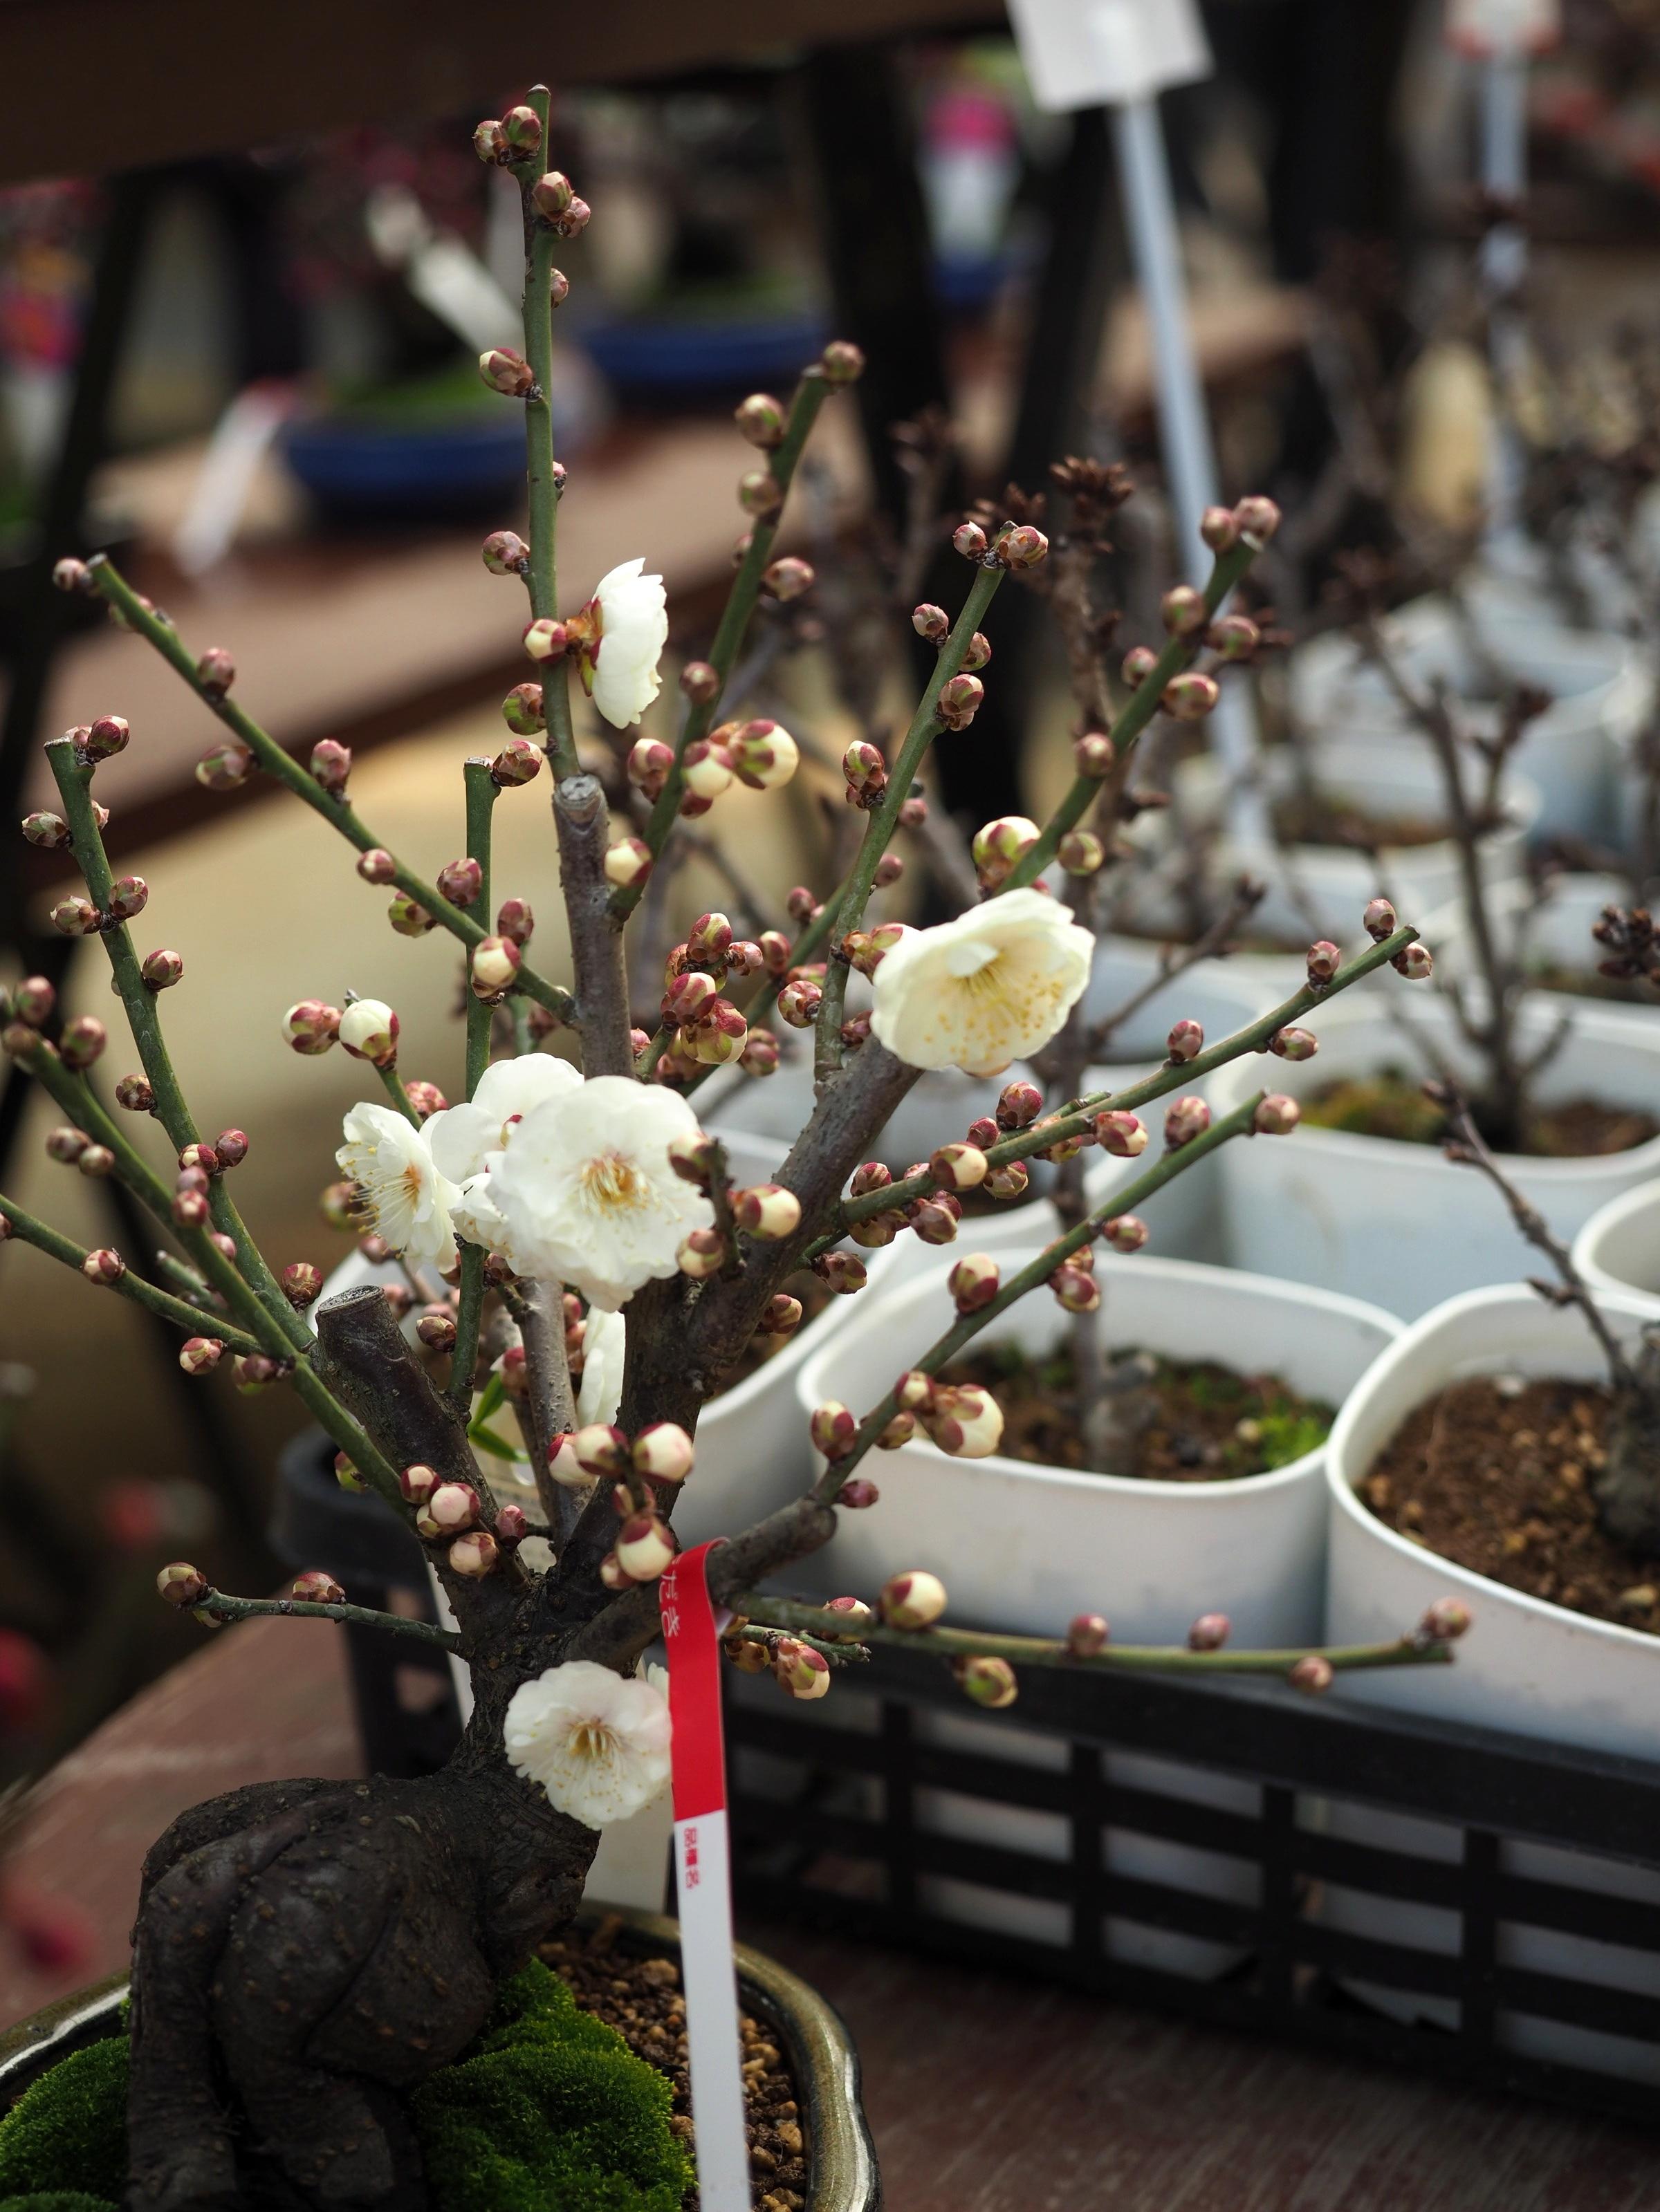 Small ume (plum) tree at Dazaifu